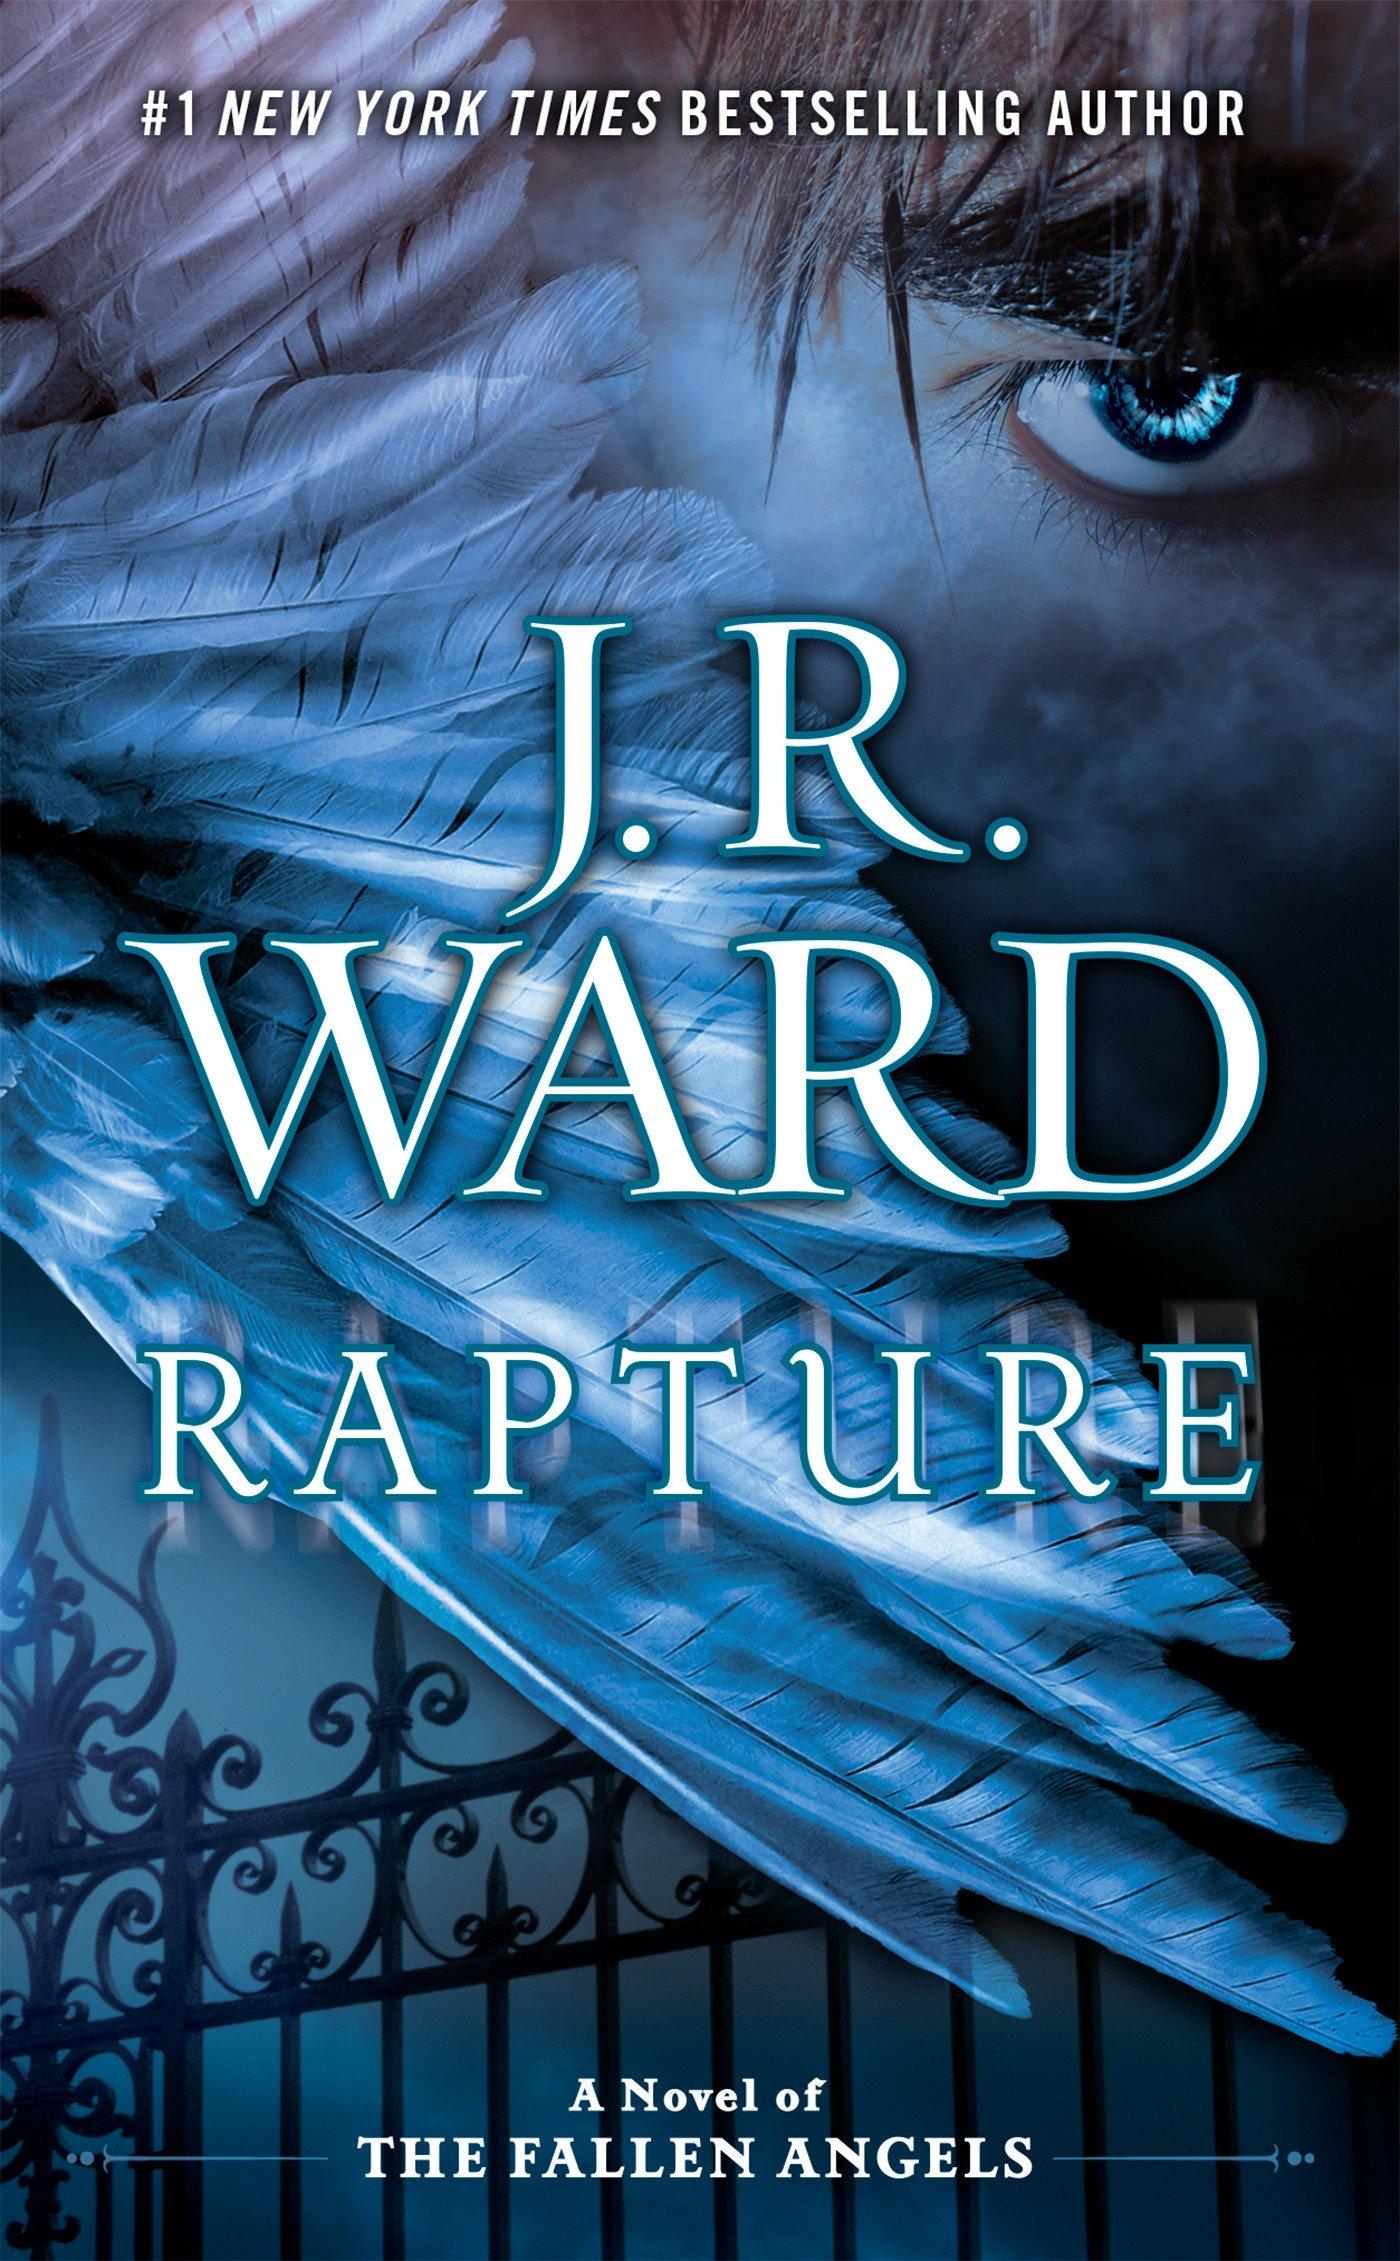 Amazon.com: Rapture (Fallen Angels, Book 4) (9780451414793): J.R. Ward:  Books